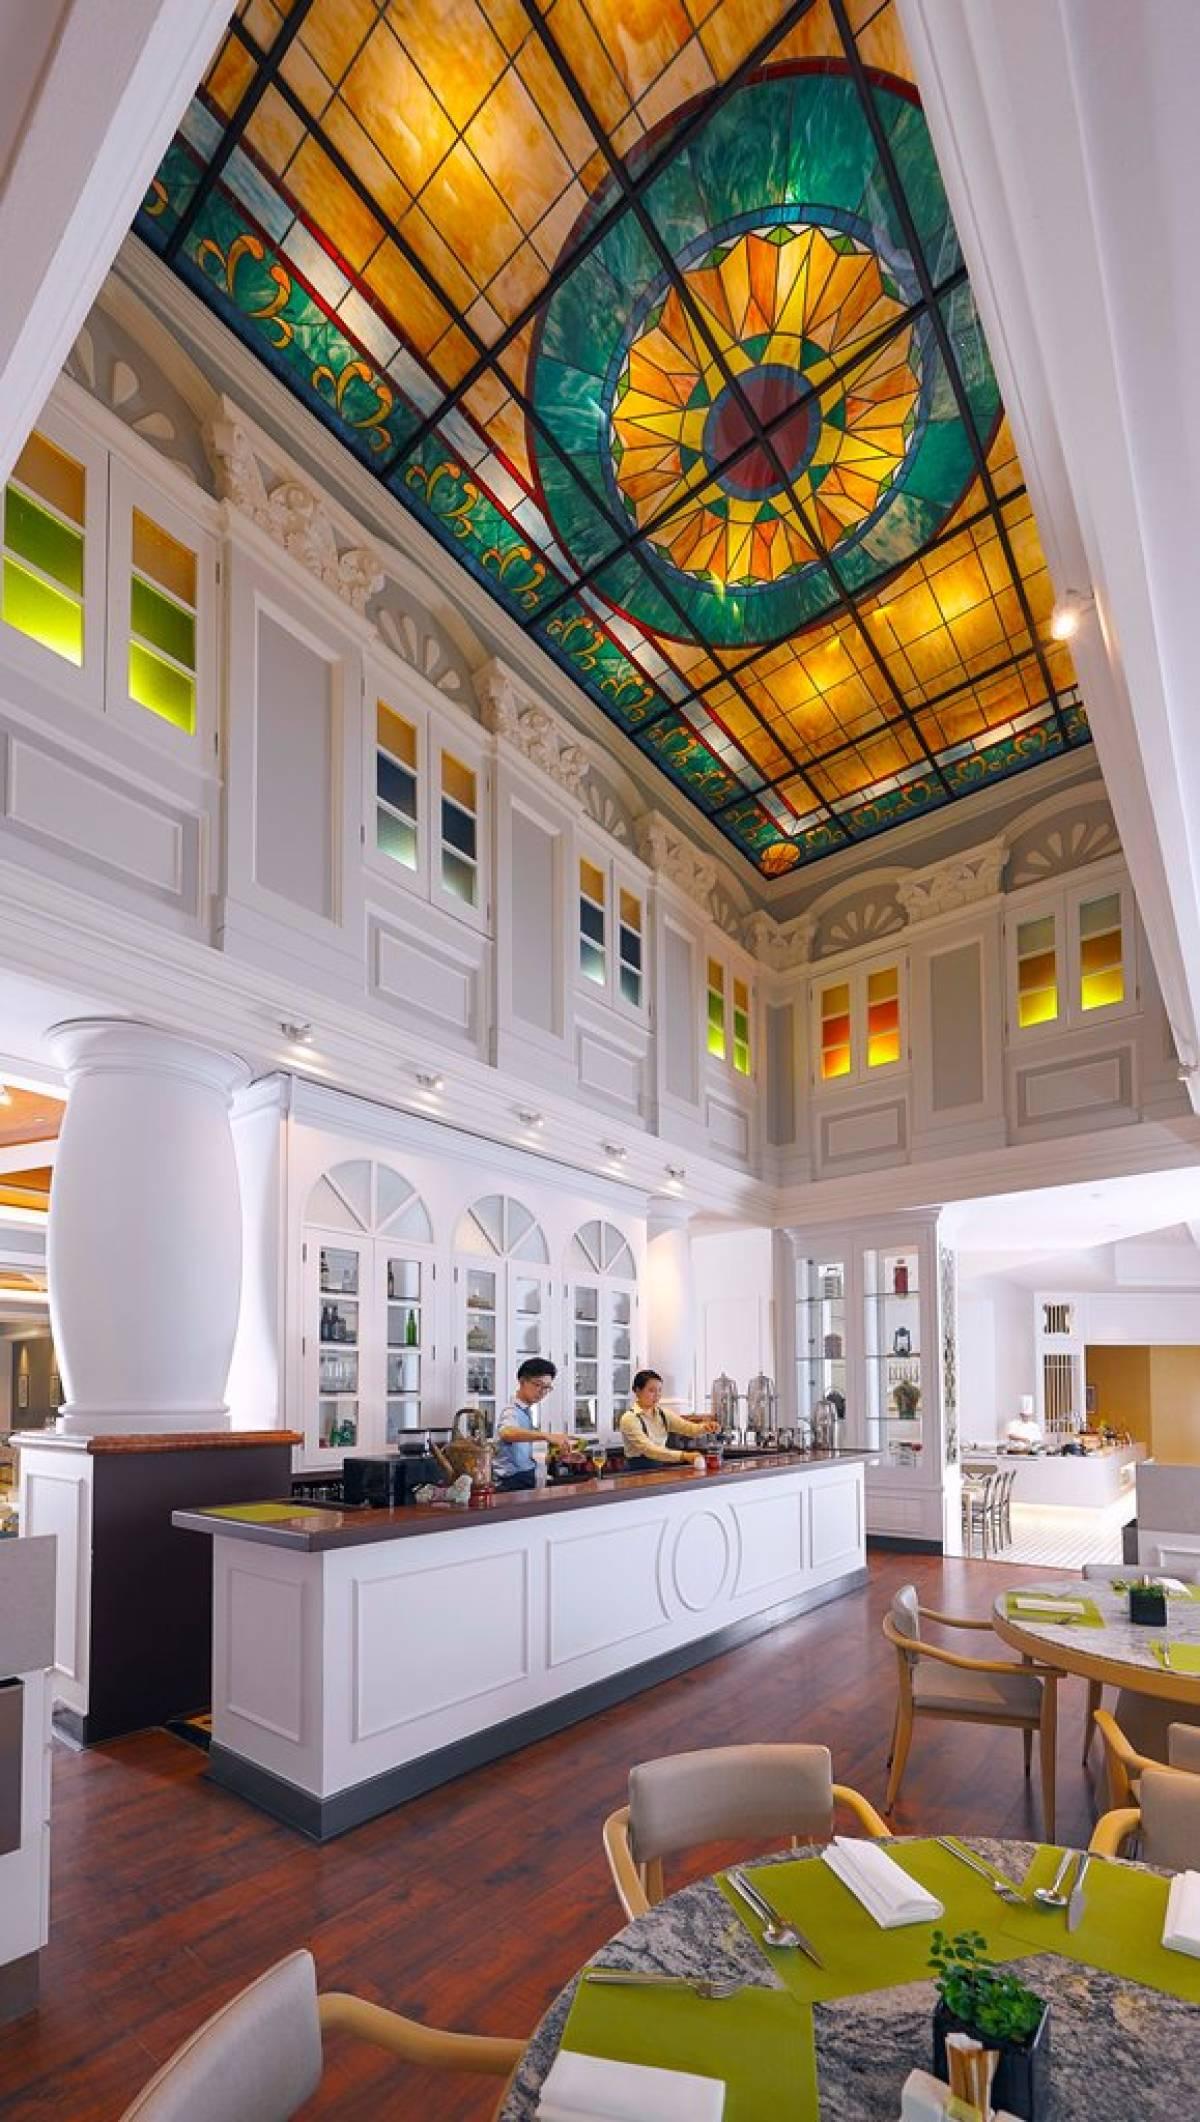 SWISSÔTEL MERCHANT COURT, SINGAPORE, A BRAND NEW HOTEL EXPERIENCE